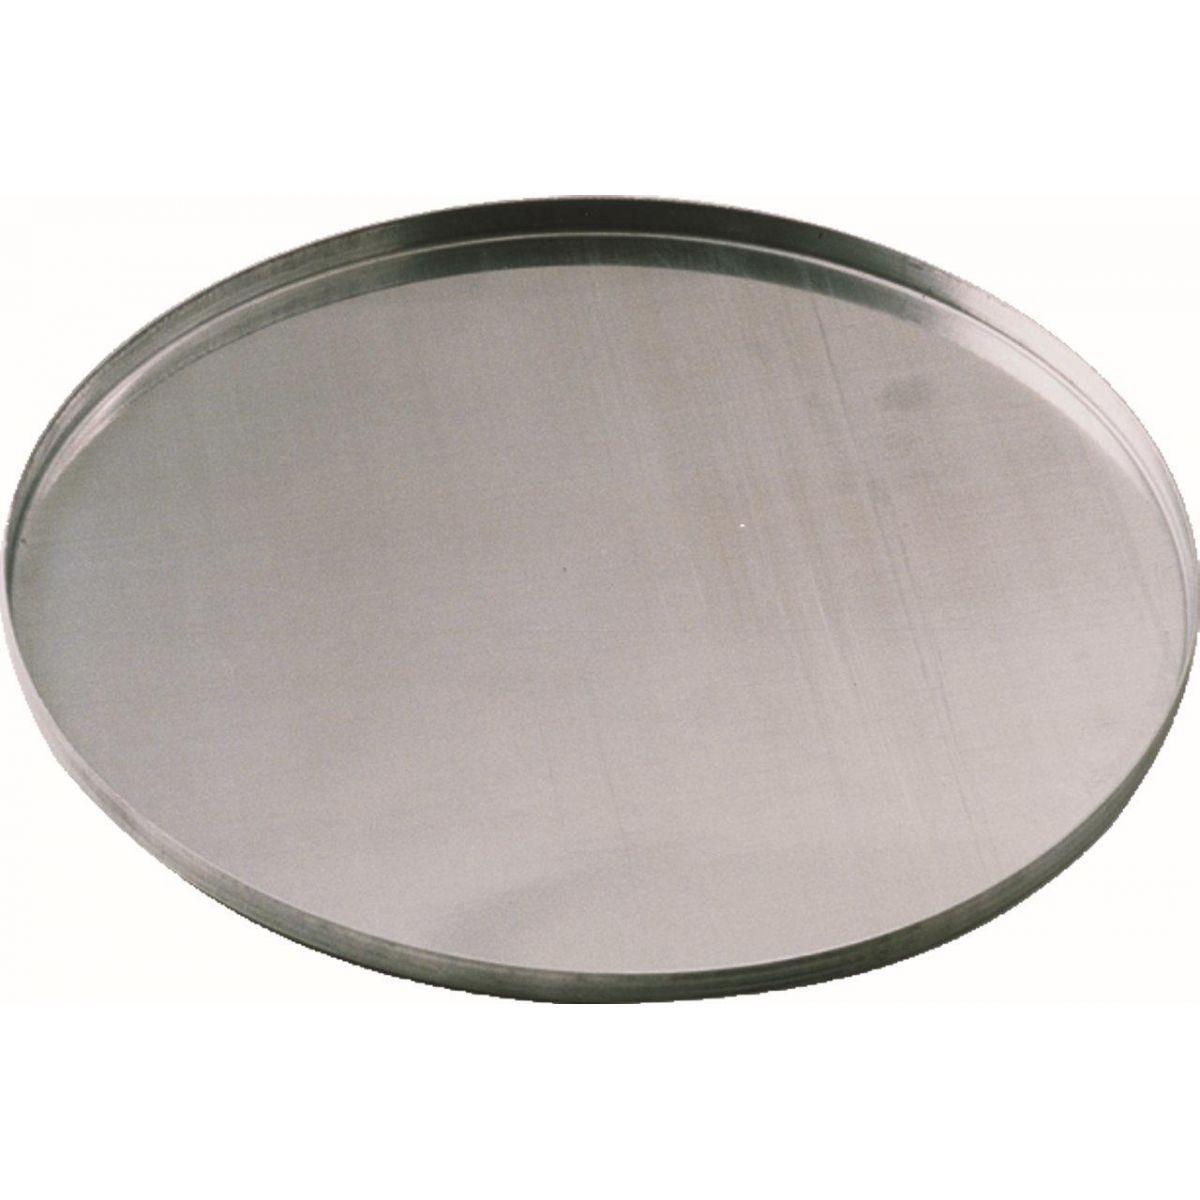 Forma P/ Pizza Nº 1 - 25 cm - Alumínio